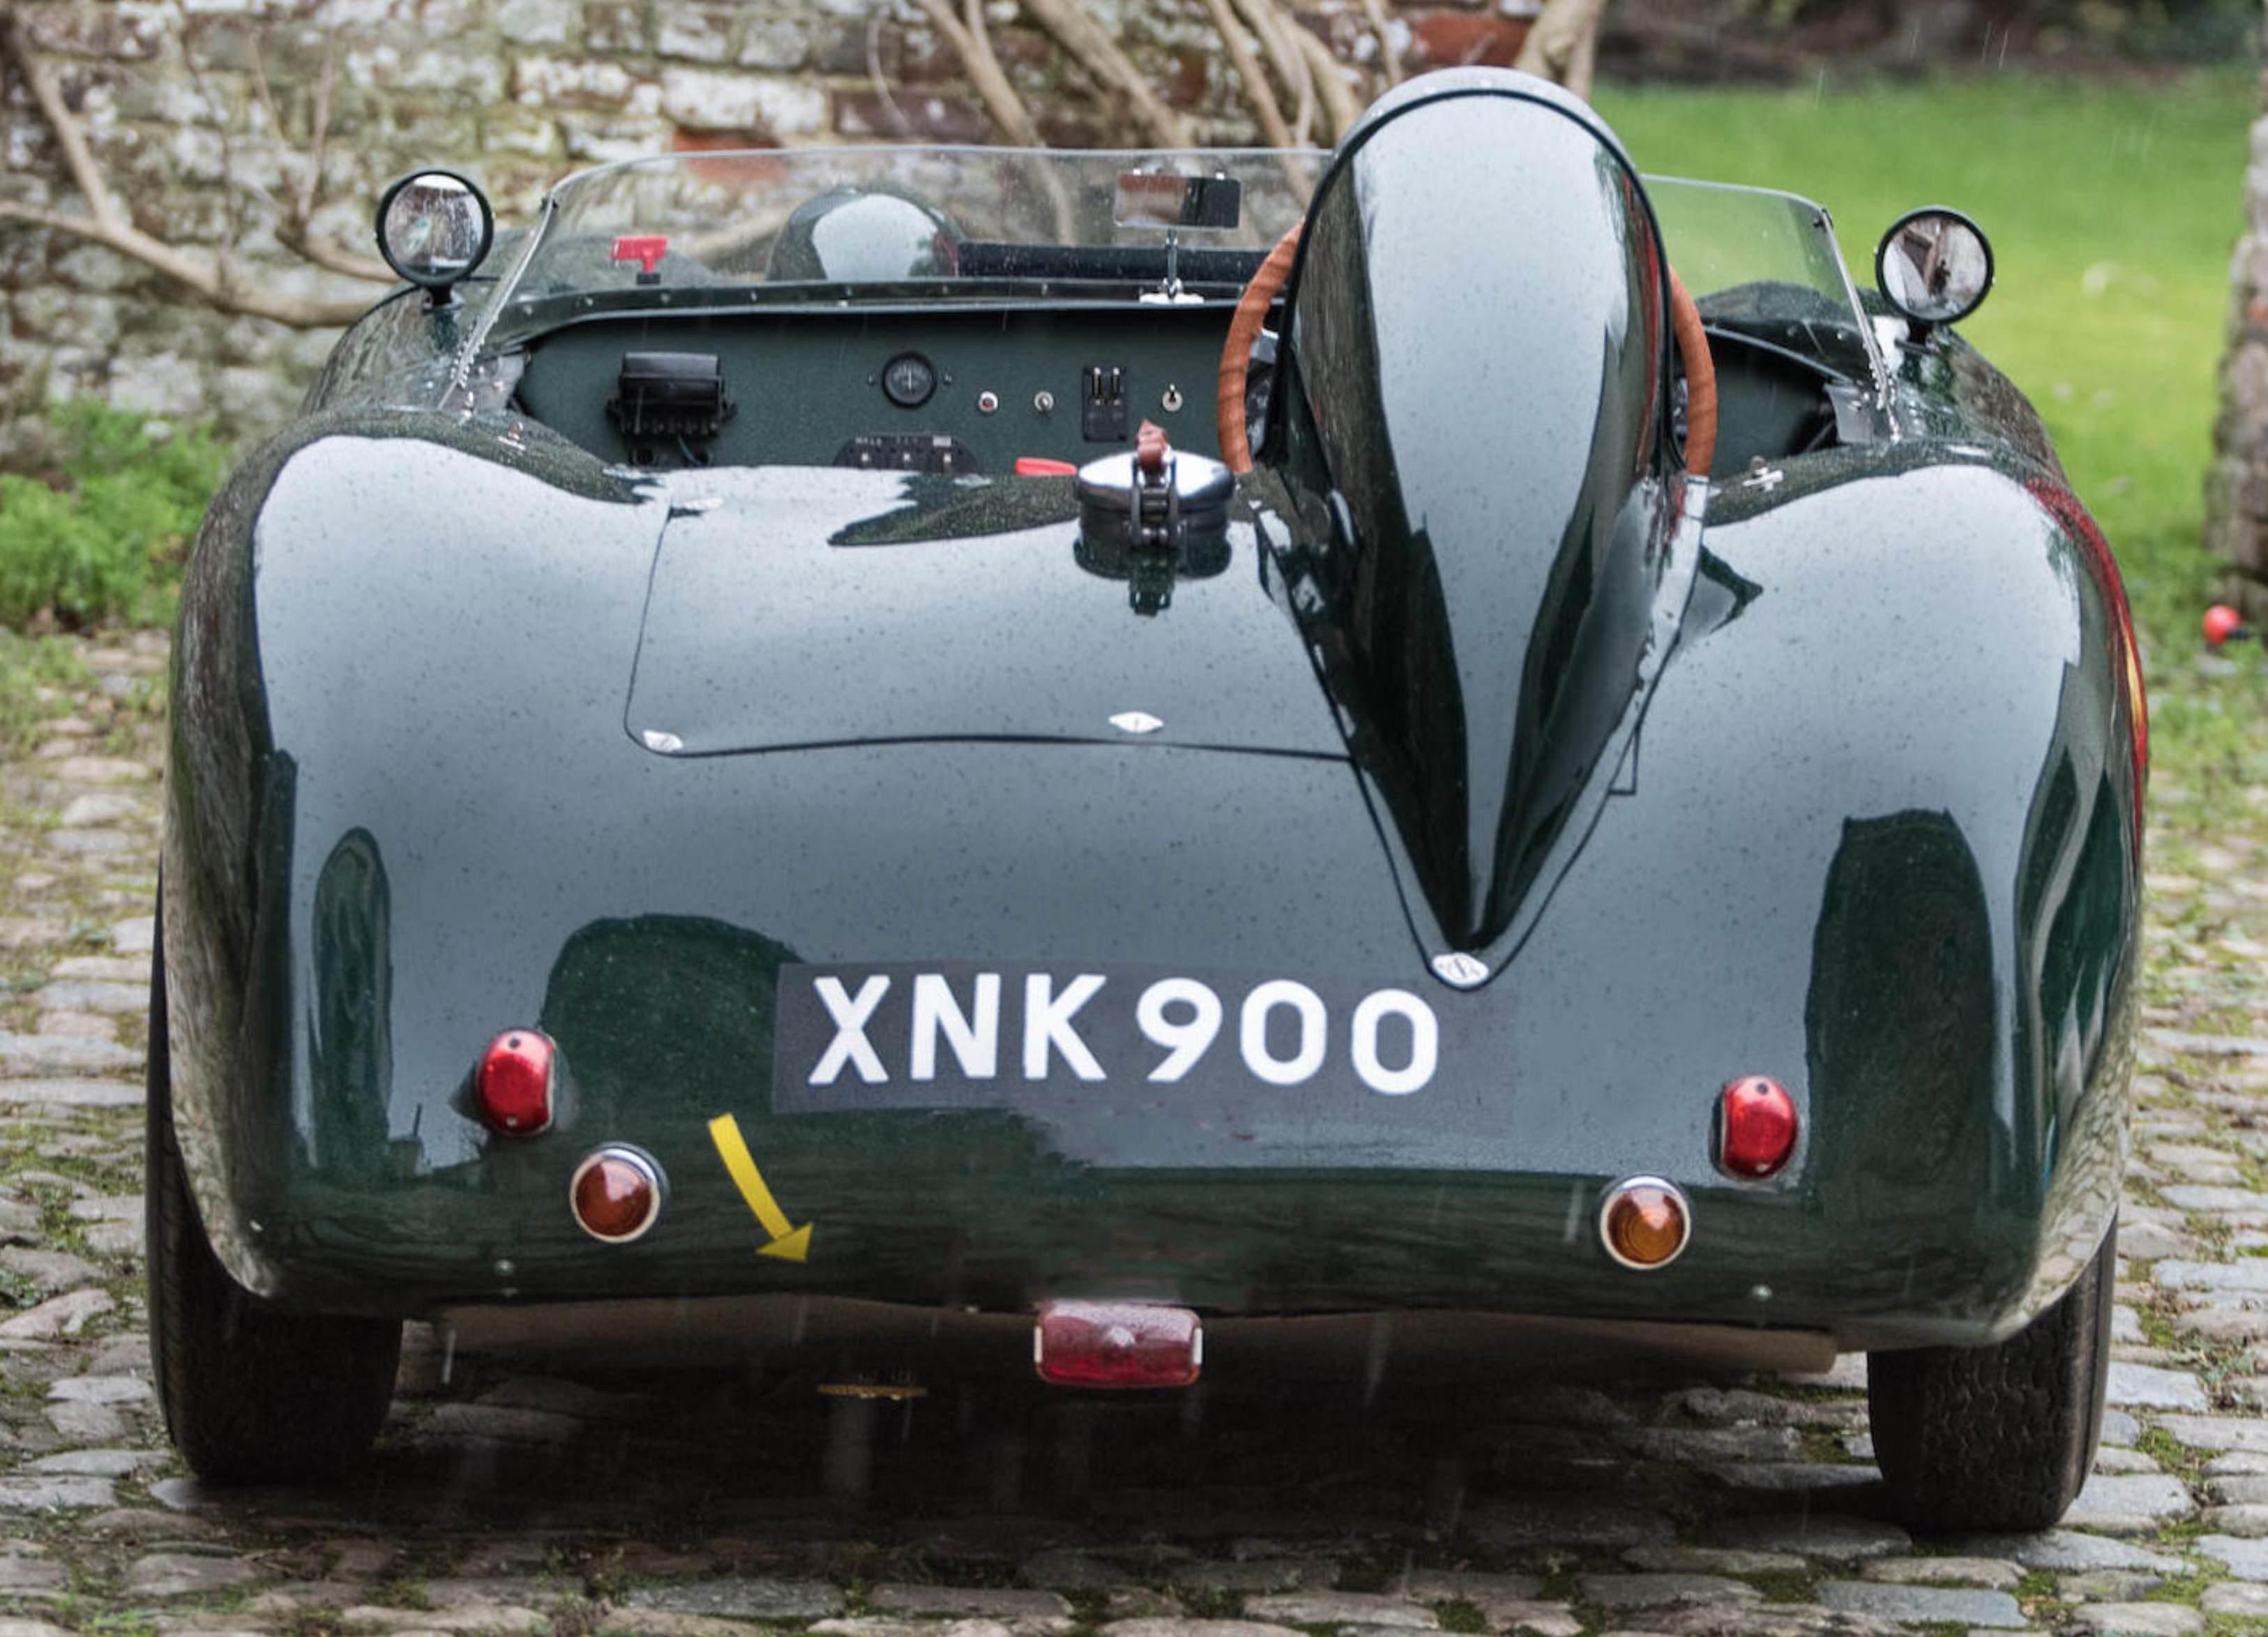 The Rare Tojeiro-Butterworth AJB Air-Cooled Racing Car